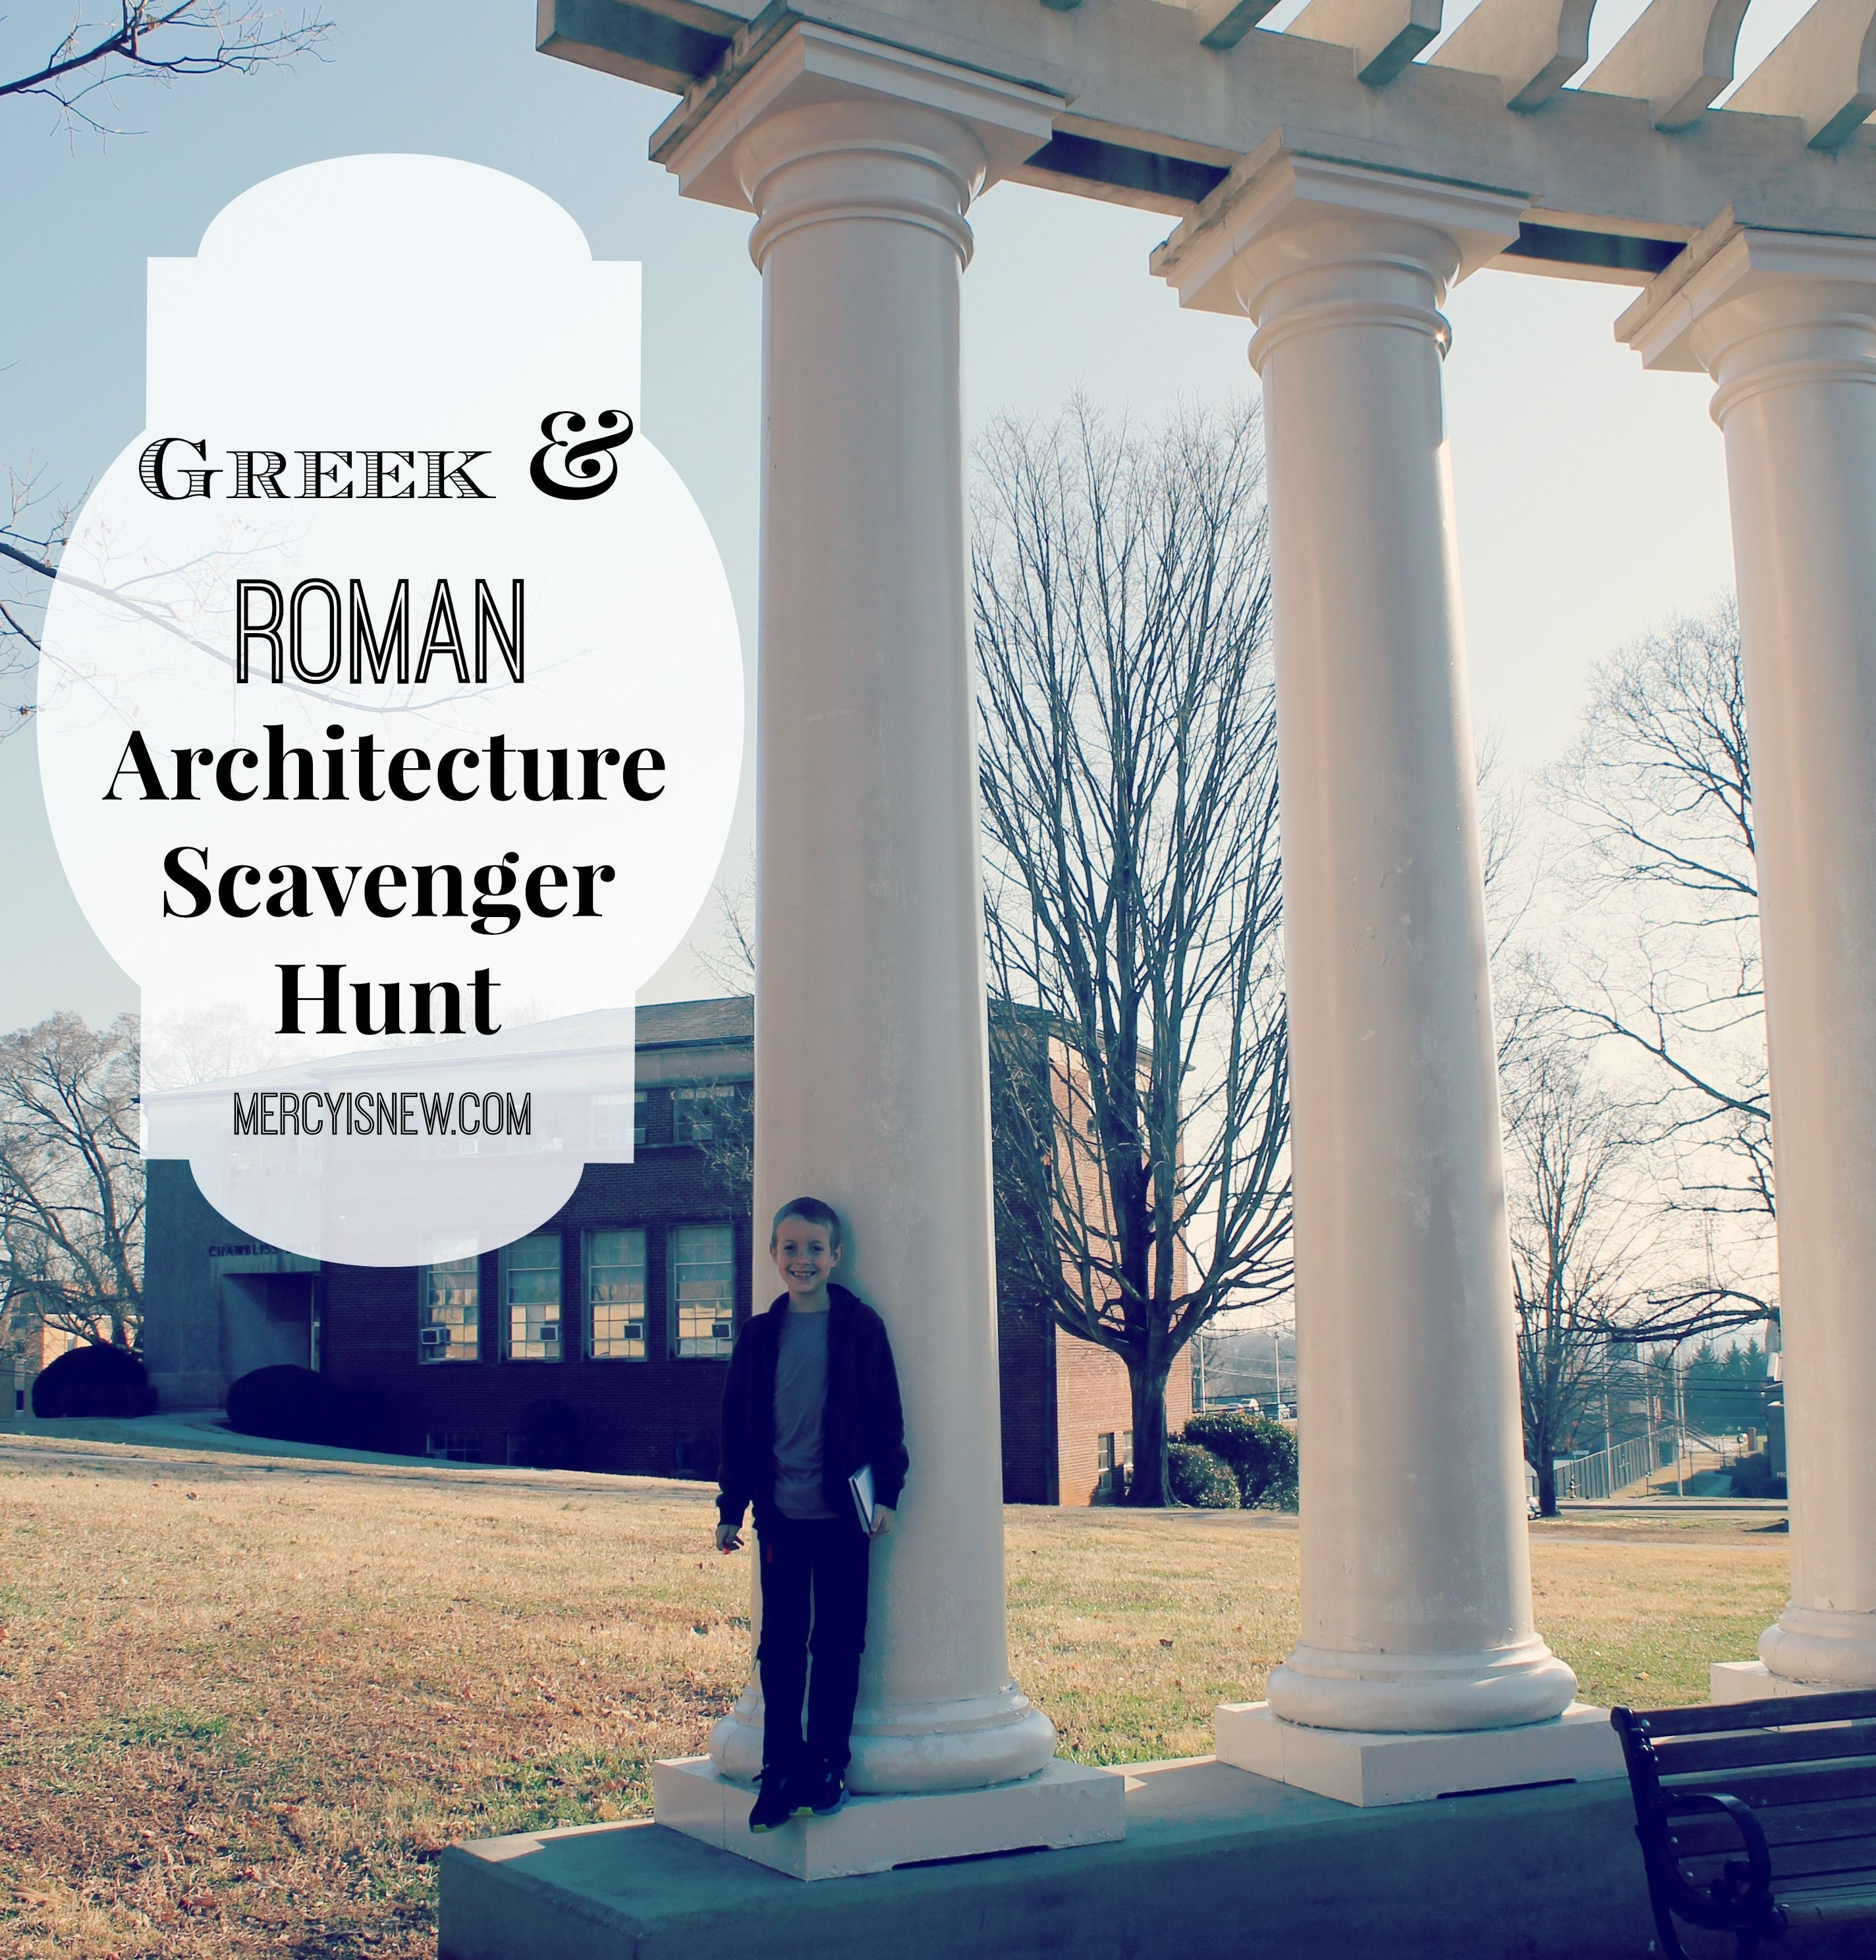 Field Trip Ideas For Greek And Roman Architecture Avenger Hunt For Greek Amp Roman Architecture